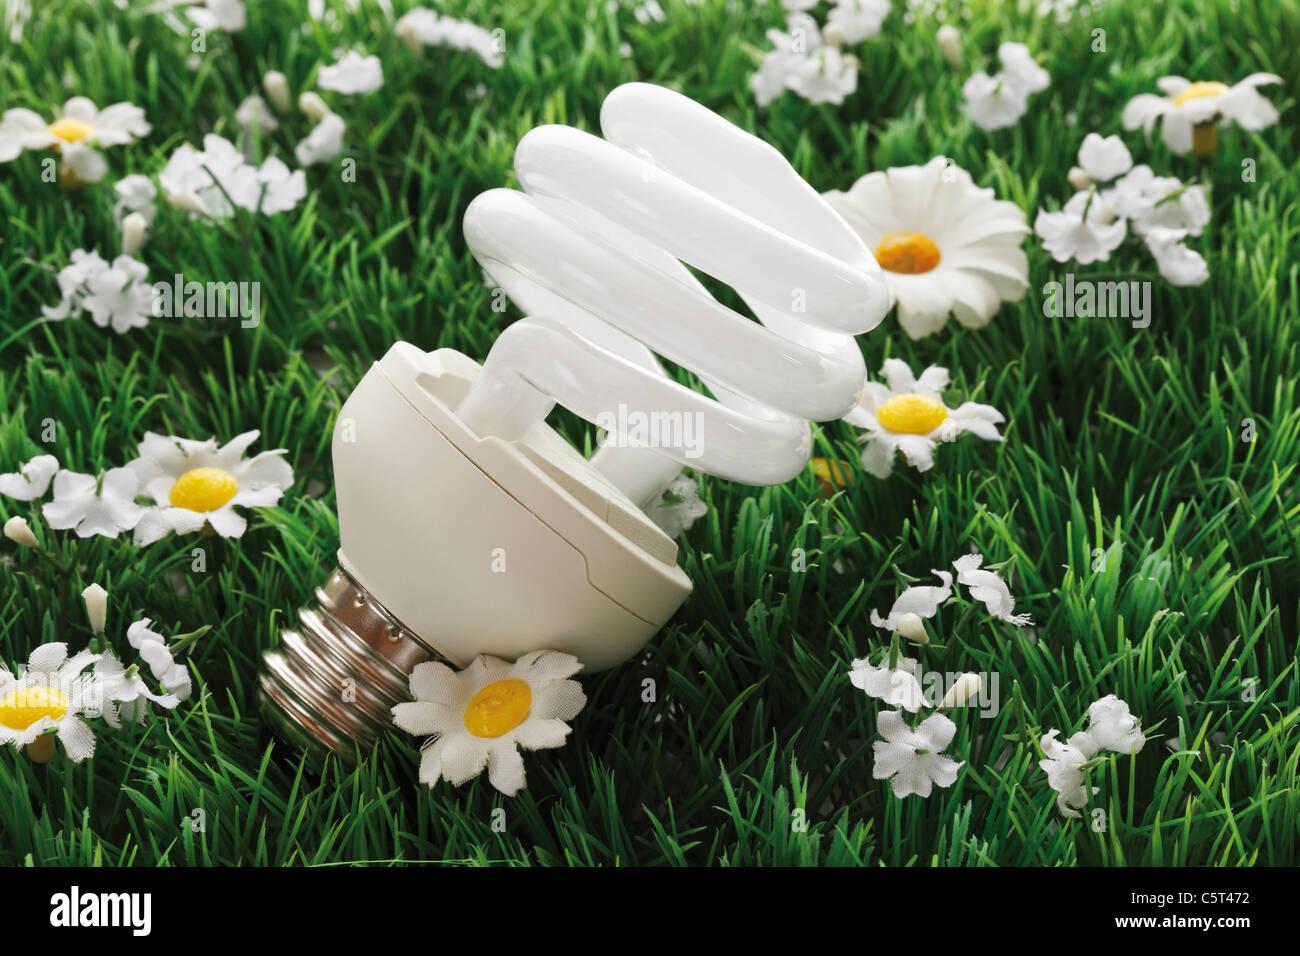 Energy saving lightbulb on synthetic turf, close-up - Stock Image